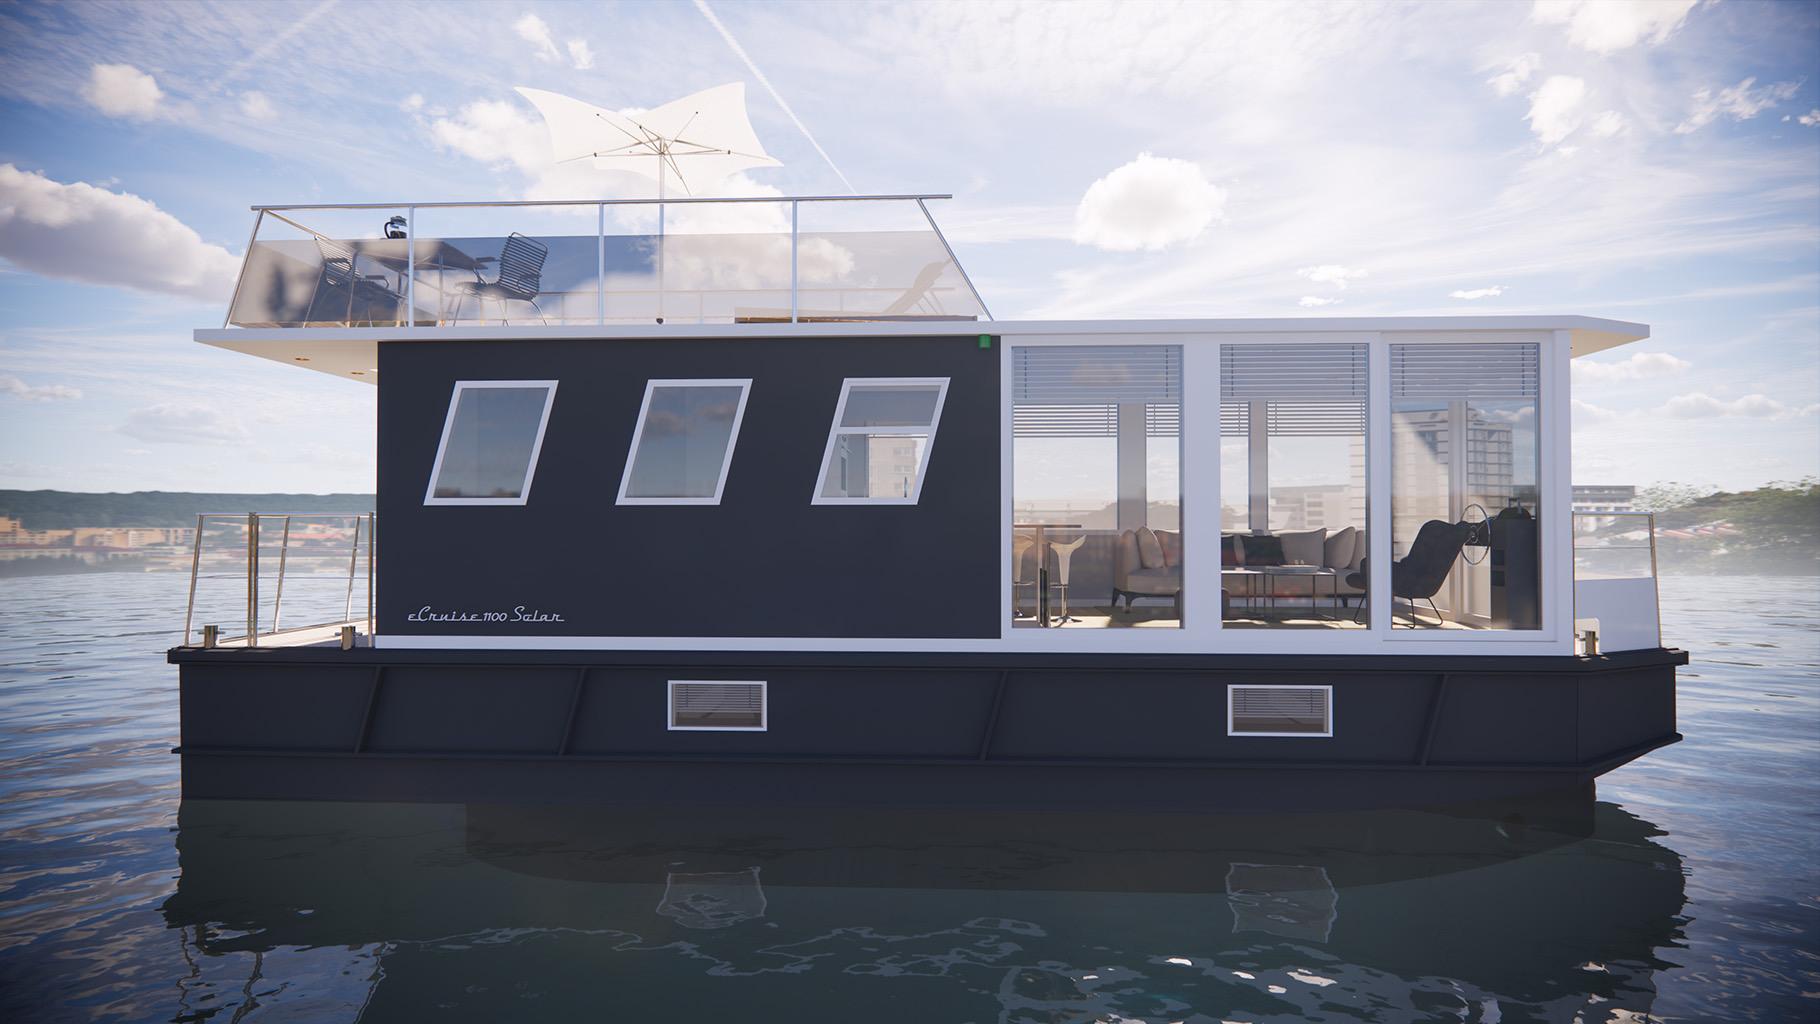 hausboot-ecruise-solar-1100-hdpe